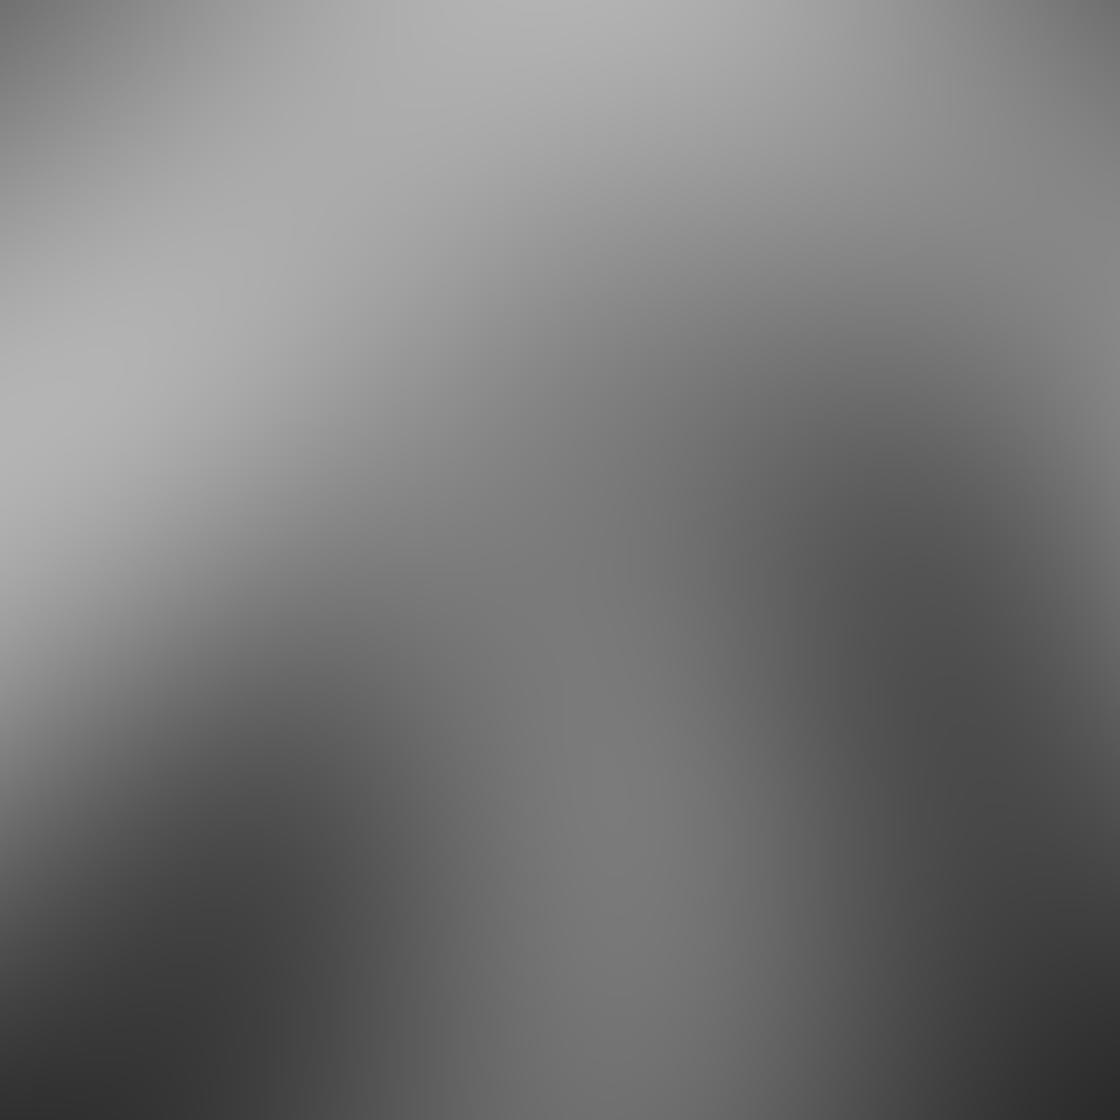 iPhone Photo Exposure 3